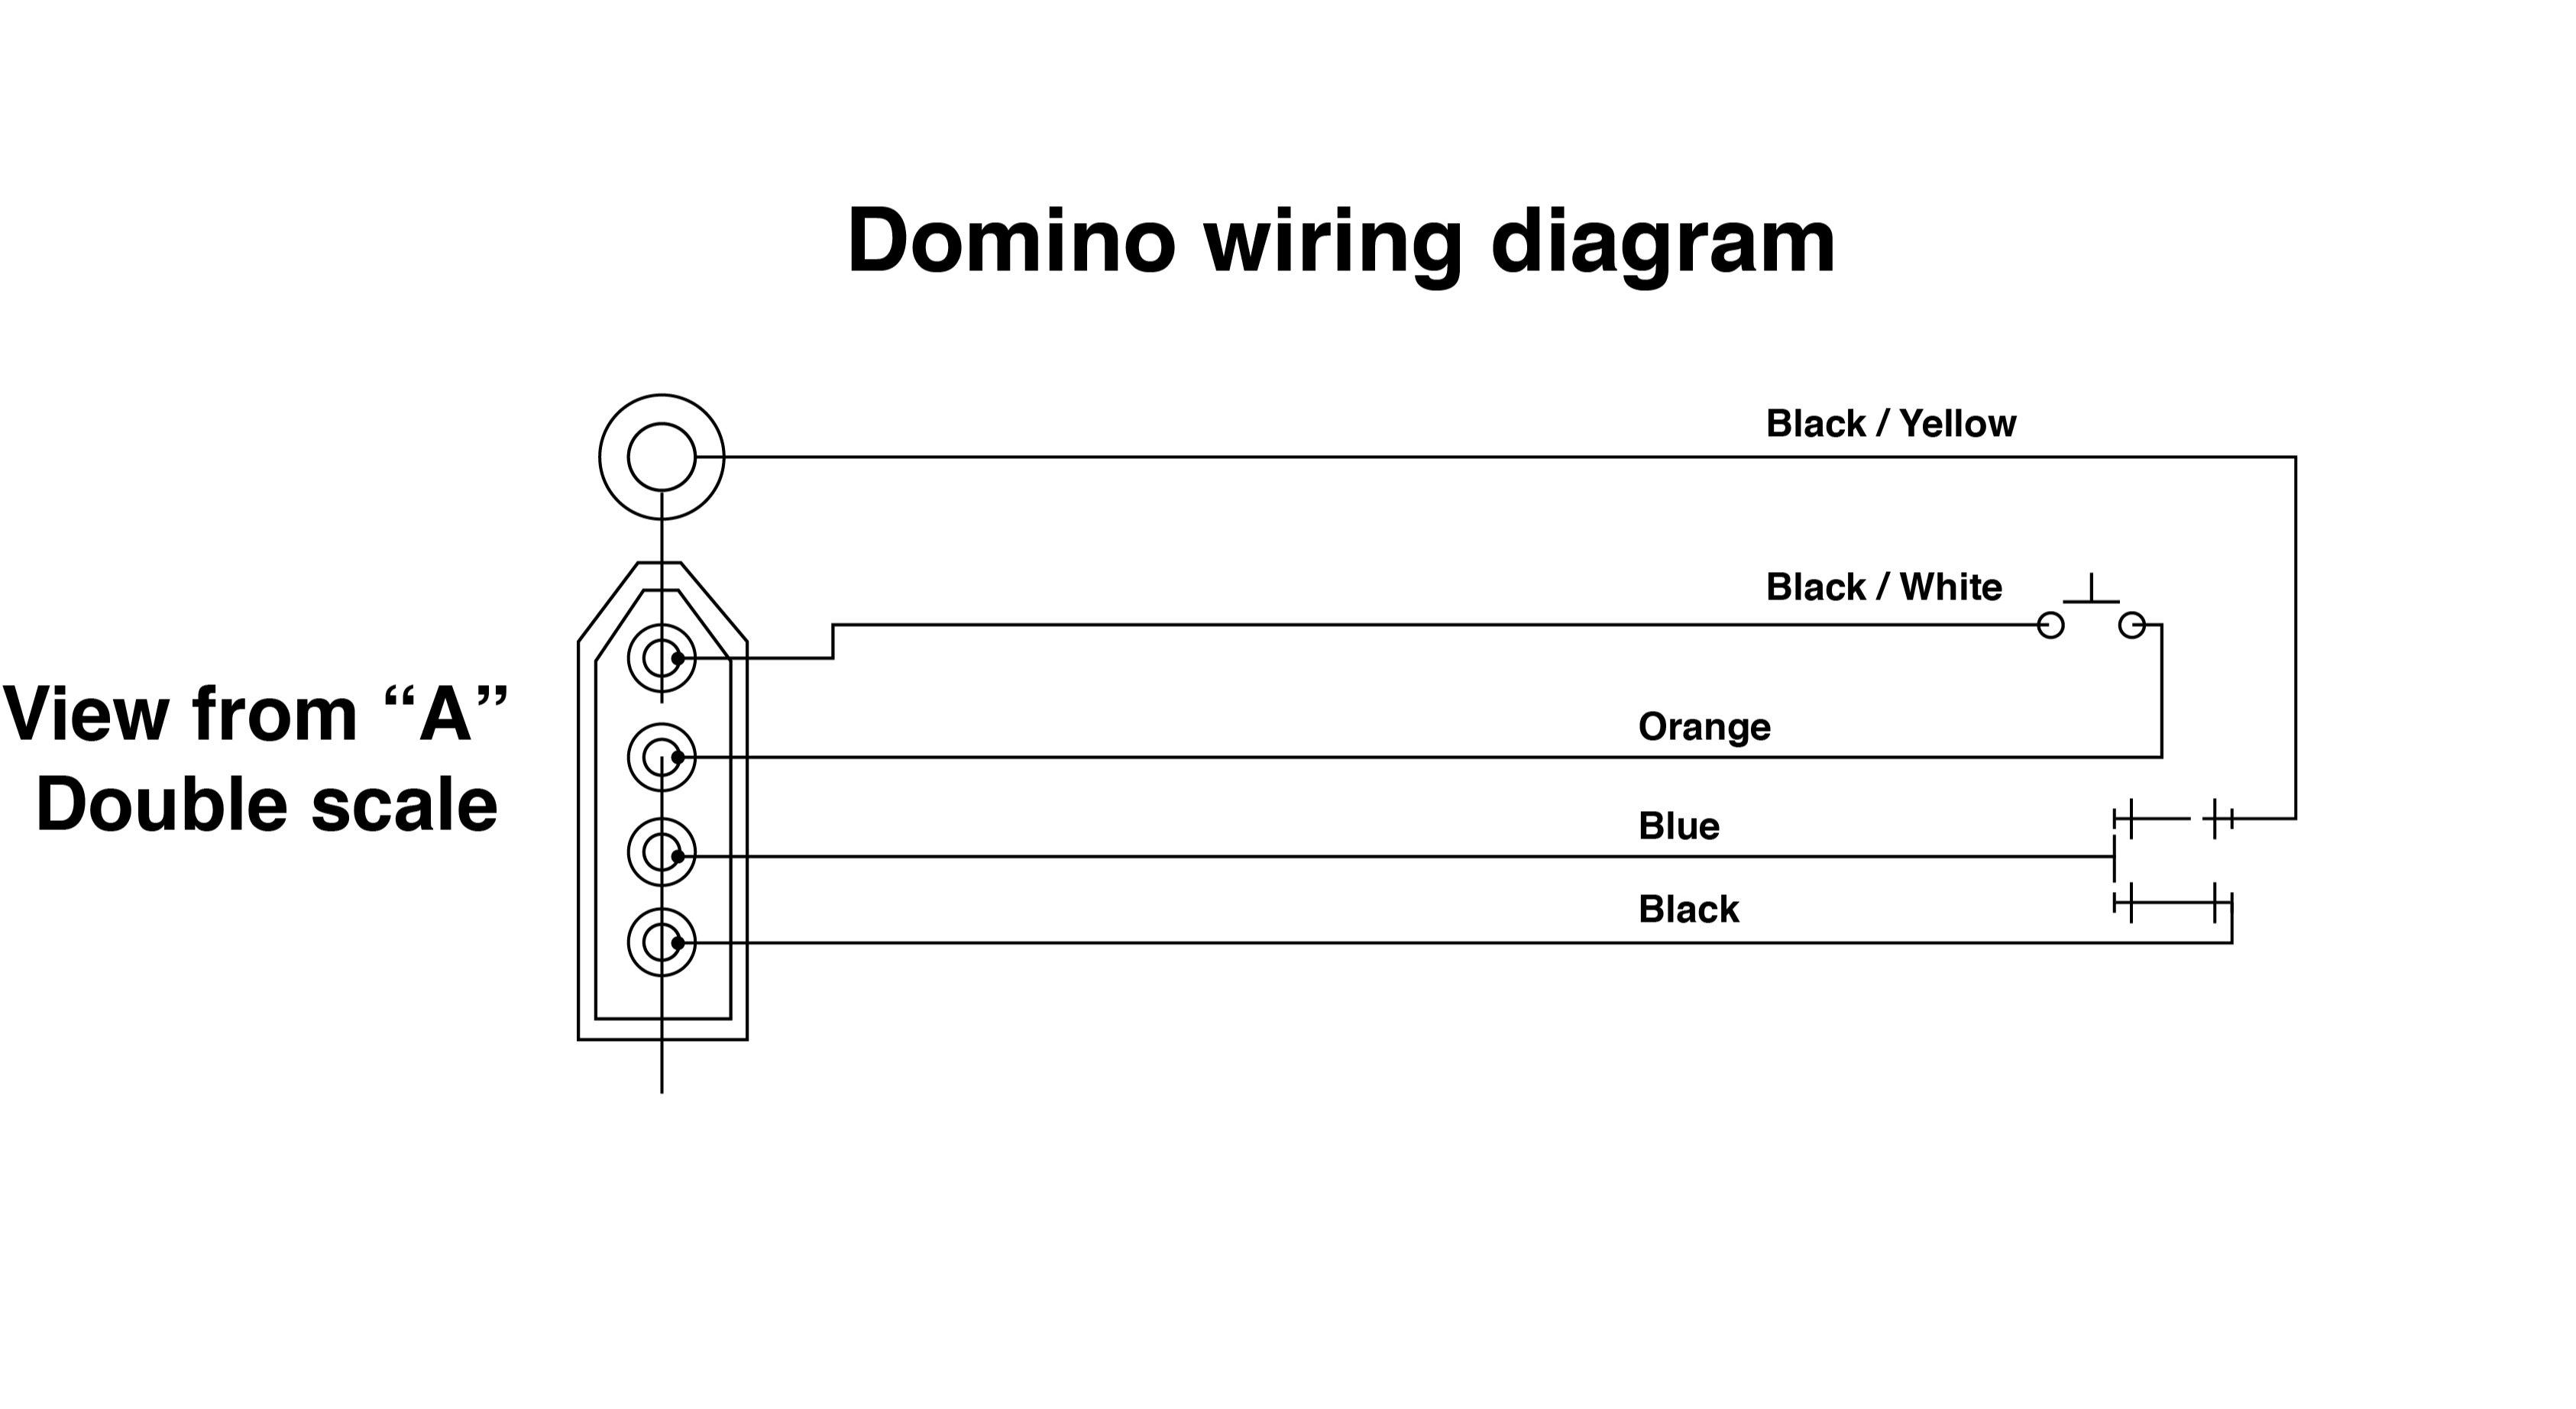 [DIAGRAM_4PO]  Wiring help please - Domino start/kill switch | Honda CBR 600RR Forum | Switch Wire Diagram |  | 600RR.net